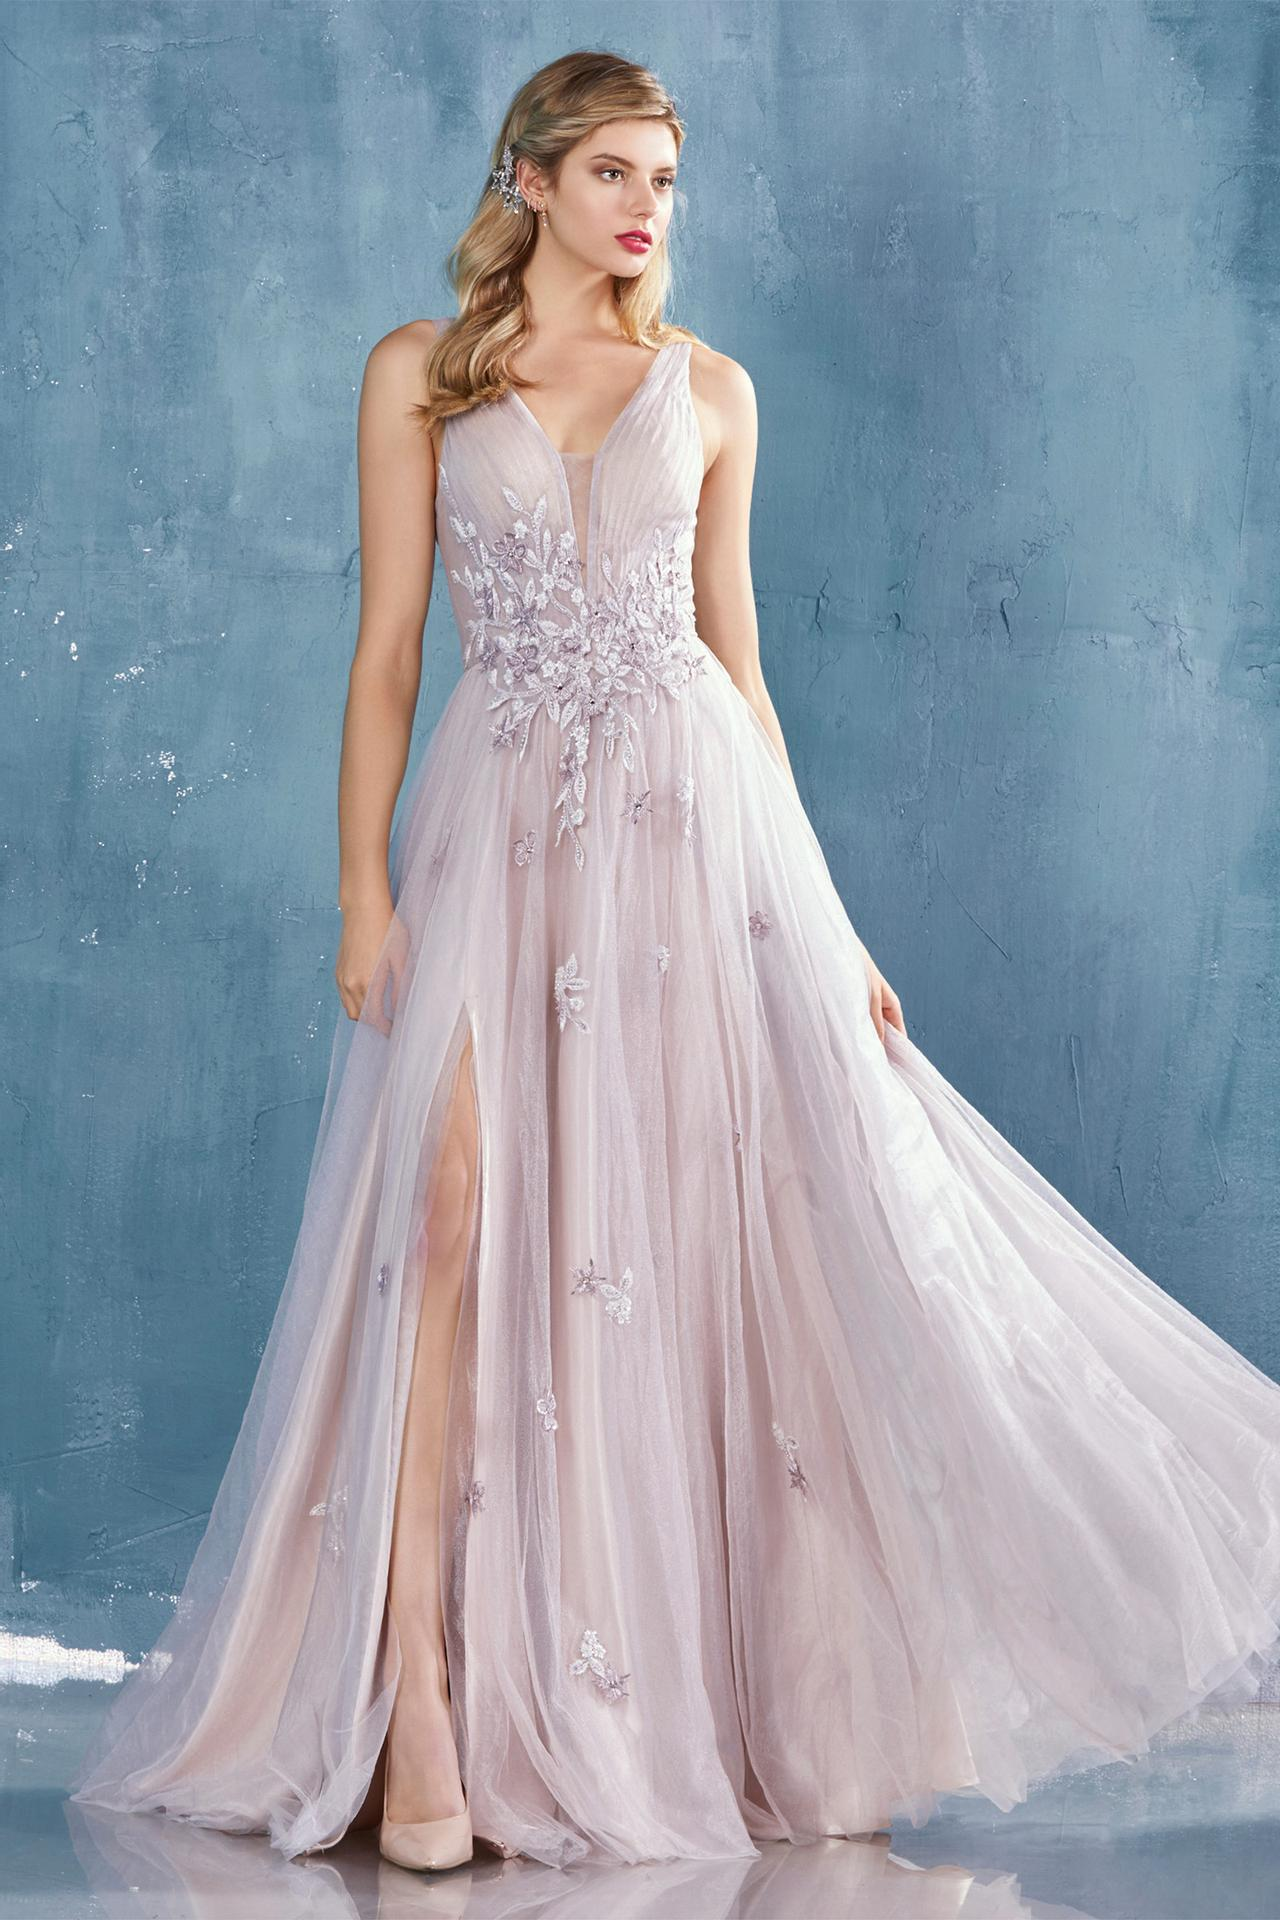 Nové spoločenské šaty :) - Obrázok č. 42